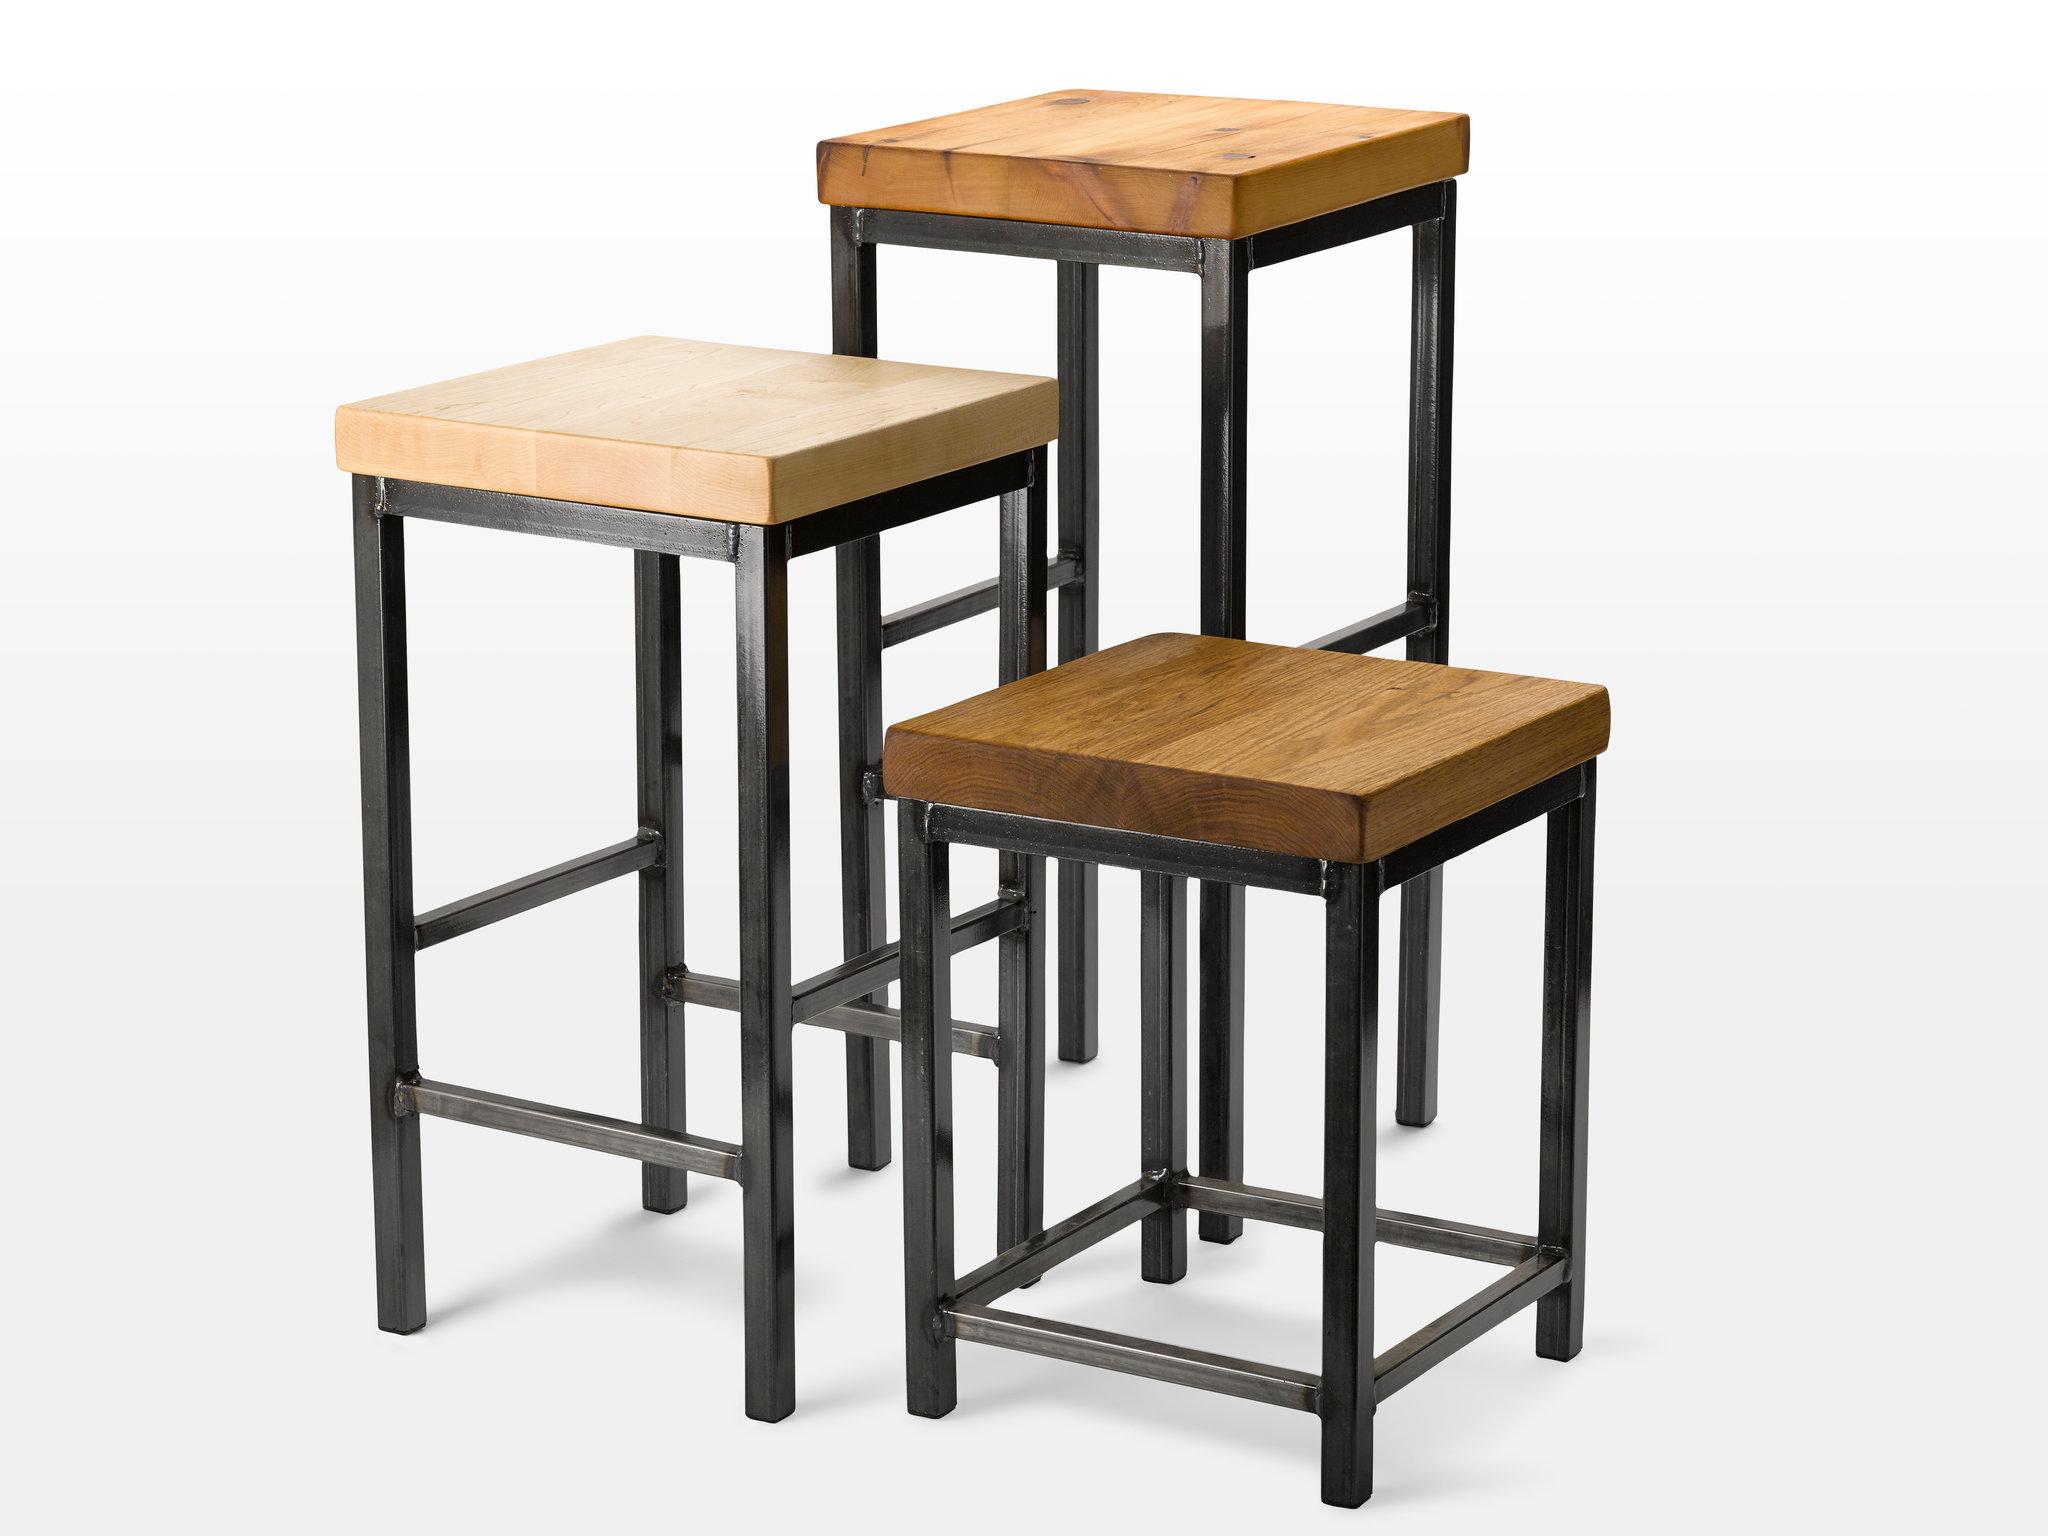 Reclaimed lumber bar stools